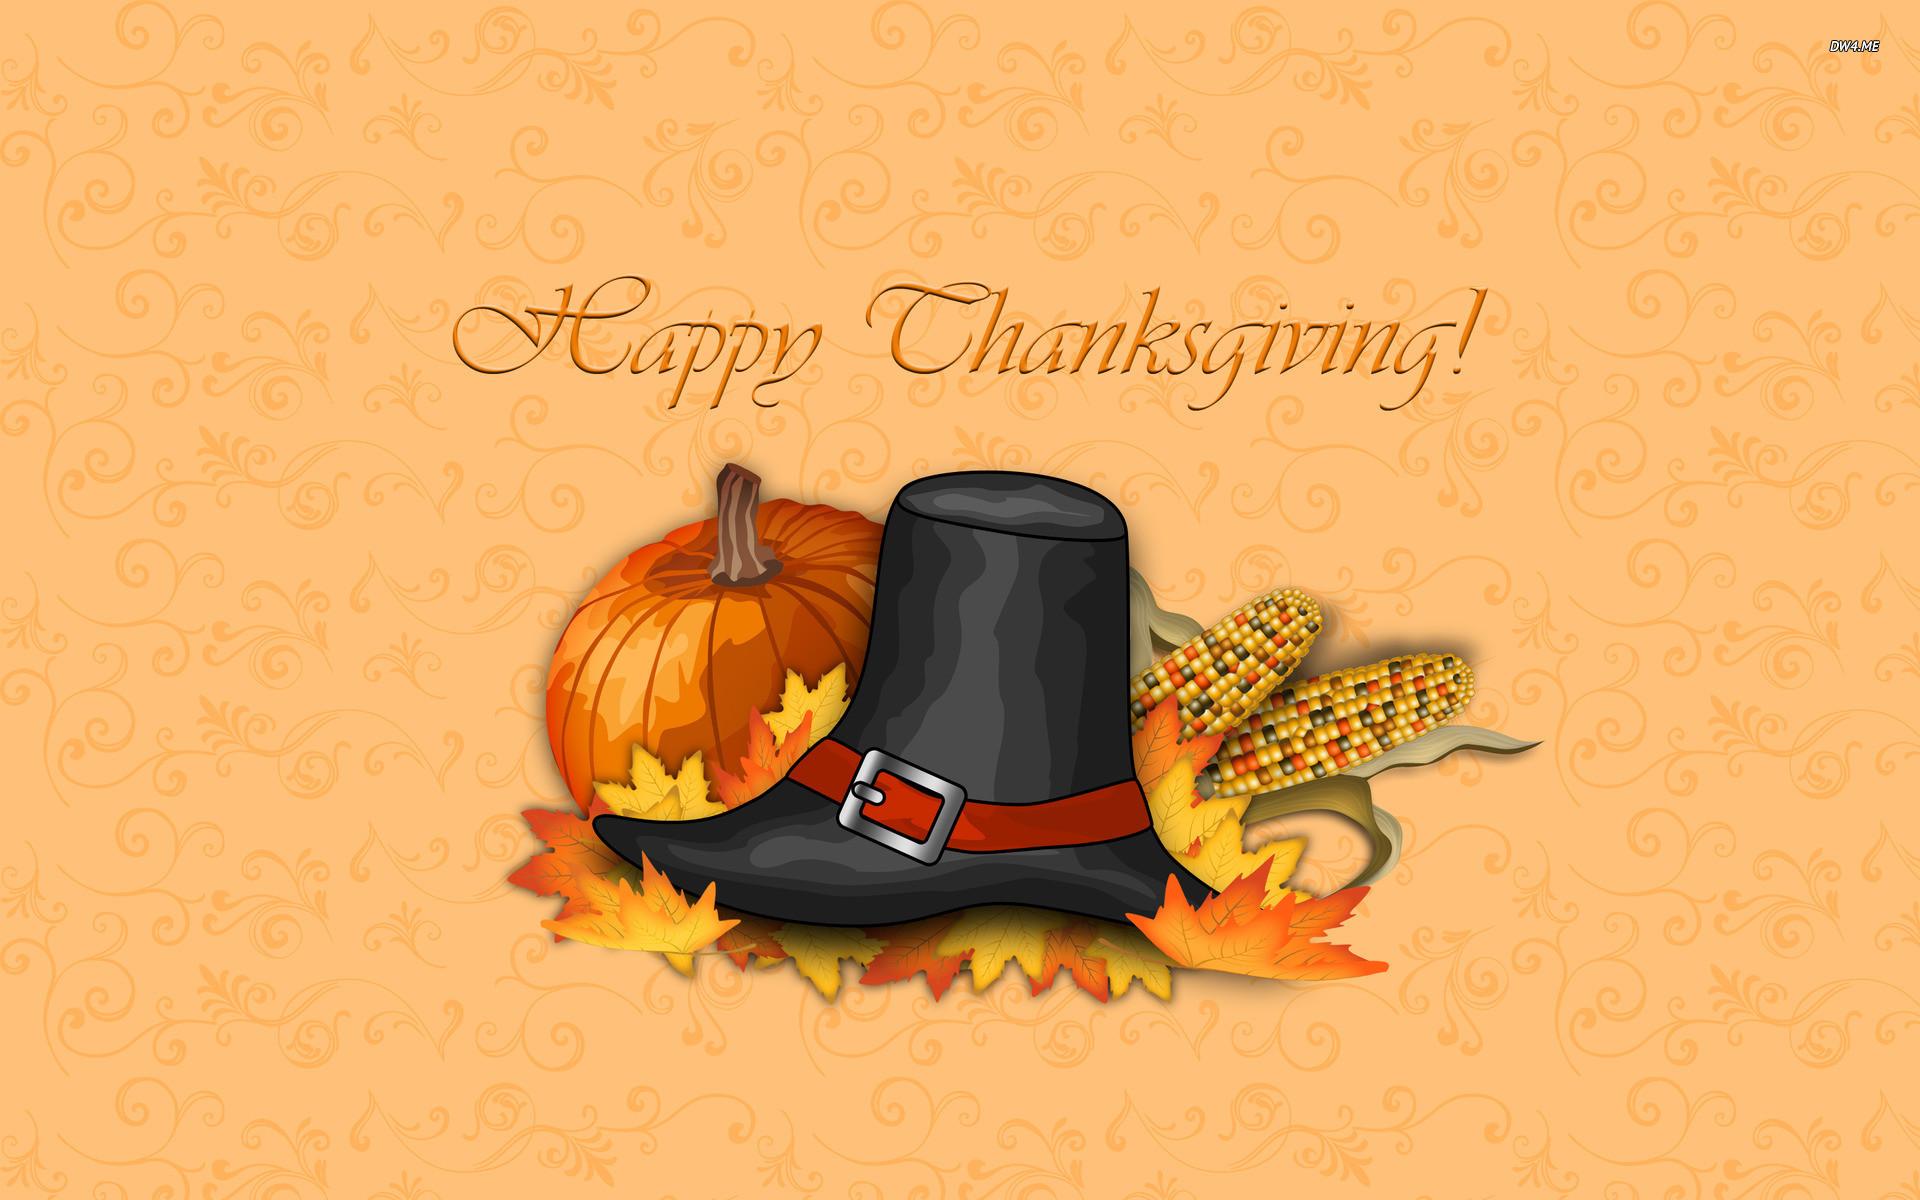 Happy Thanksgiving Wallpaper Cute